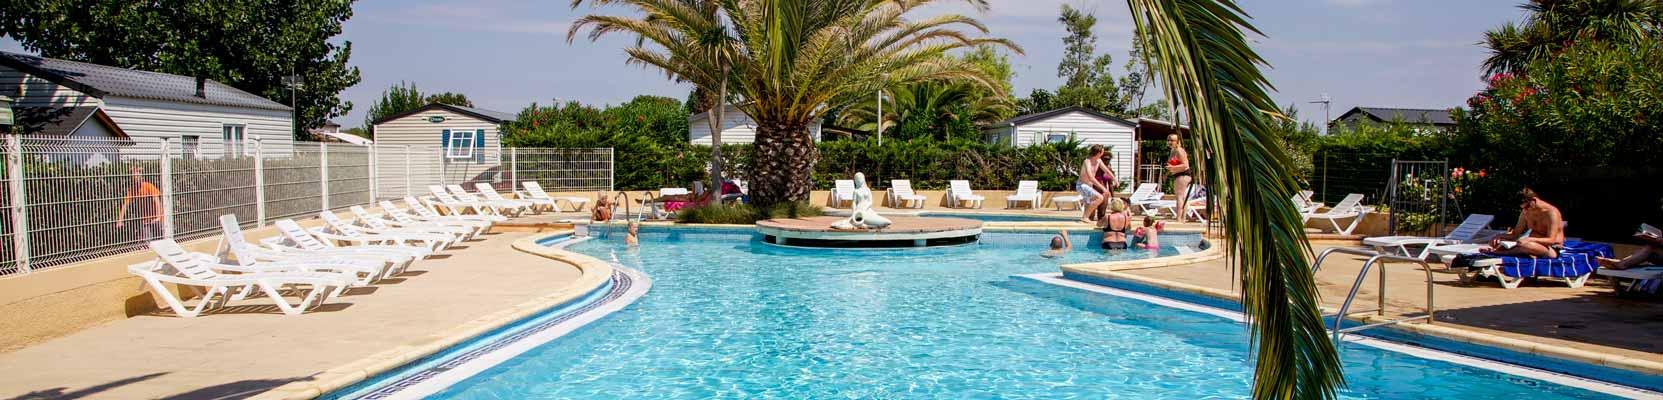 camping piscine 5 étoiles herault